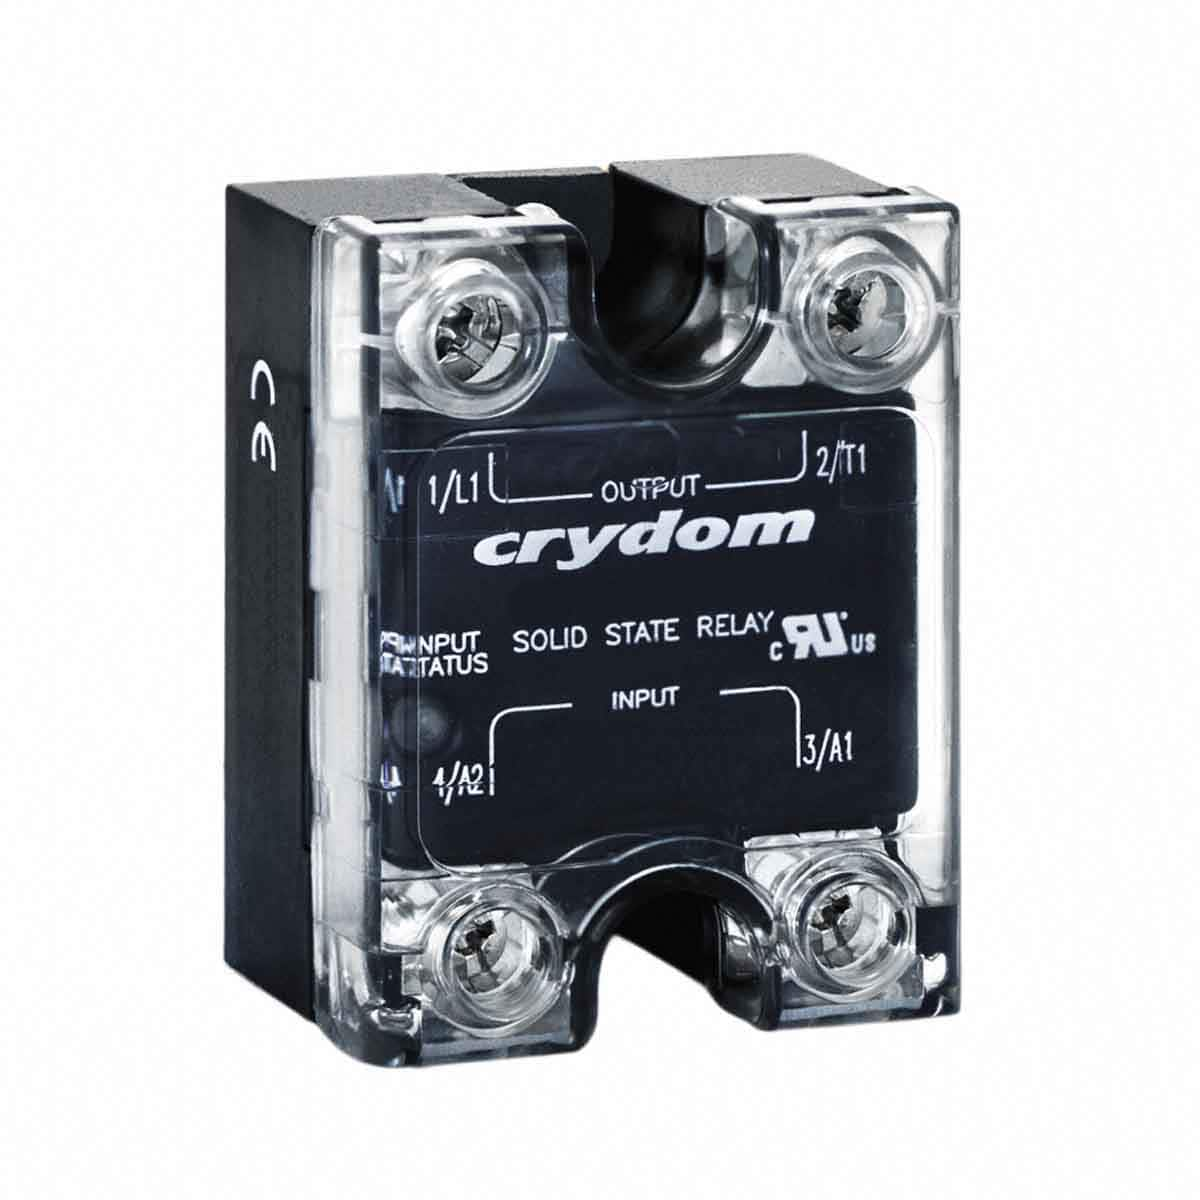 CWU2490-10 by Sensata-Crydom